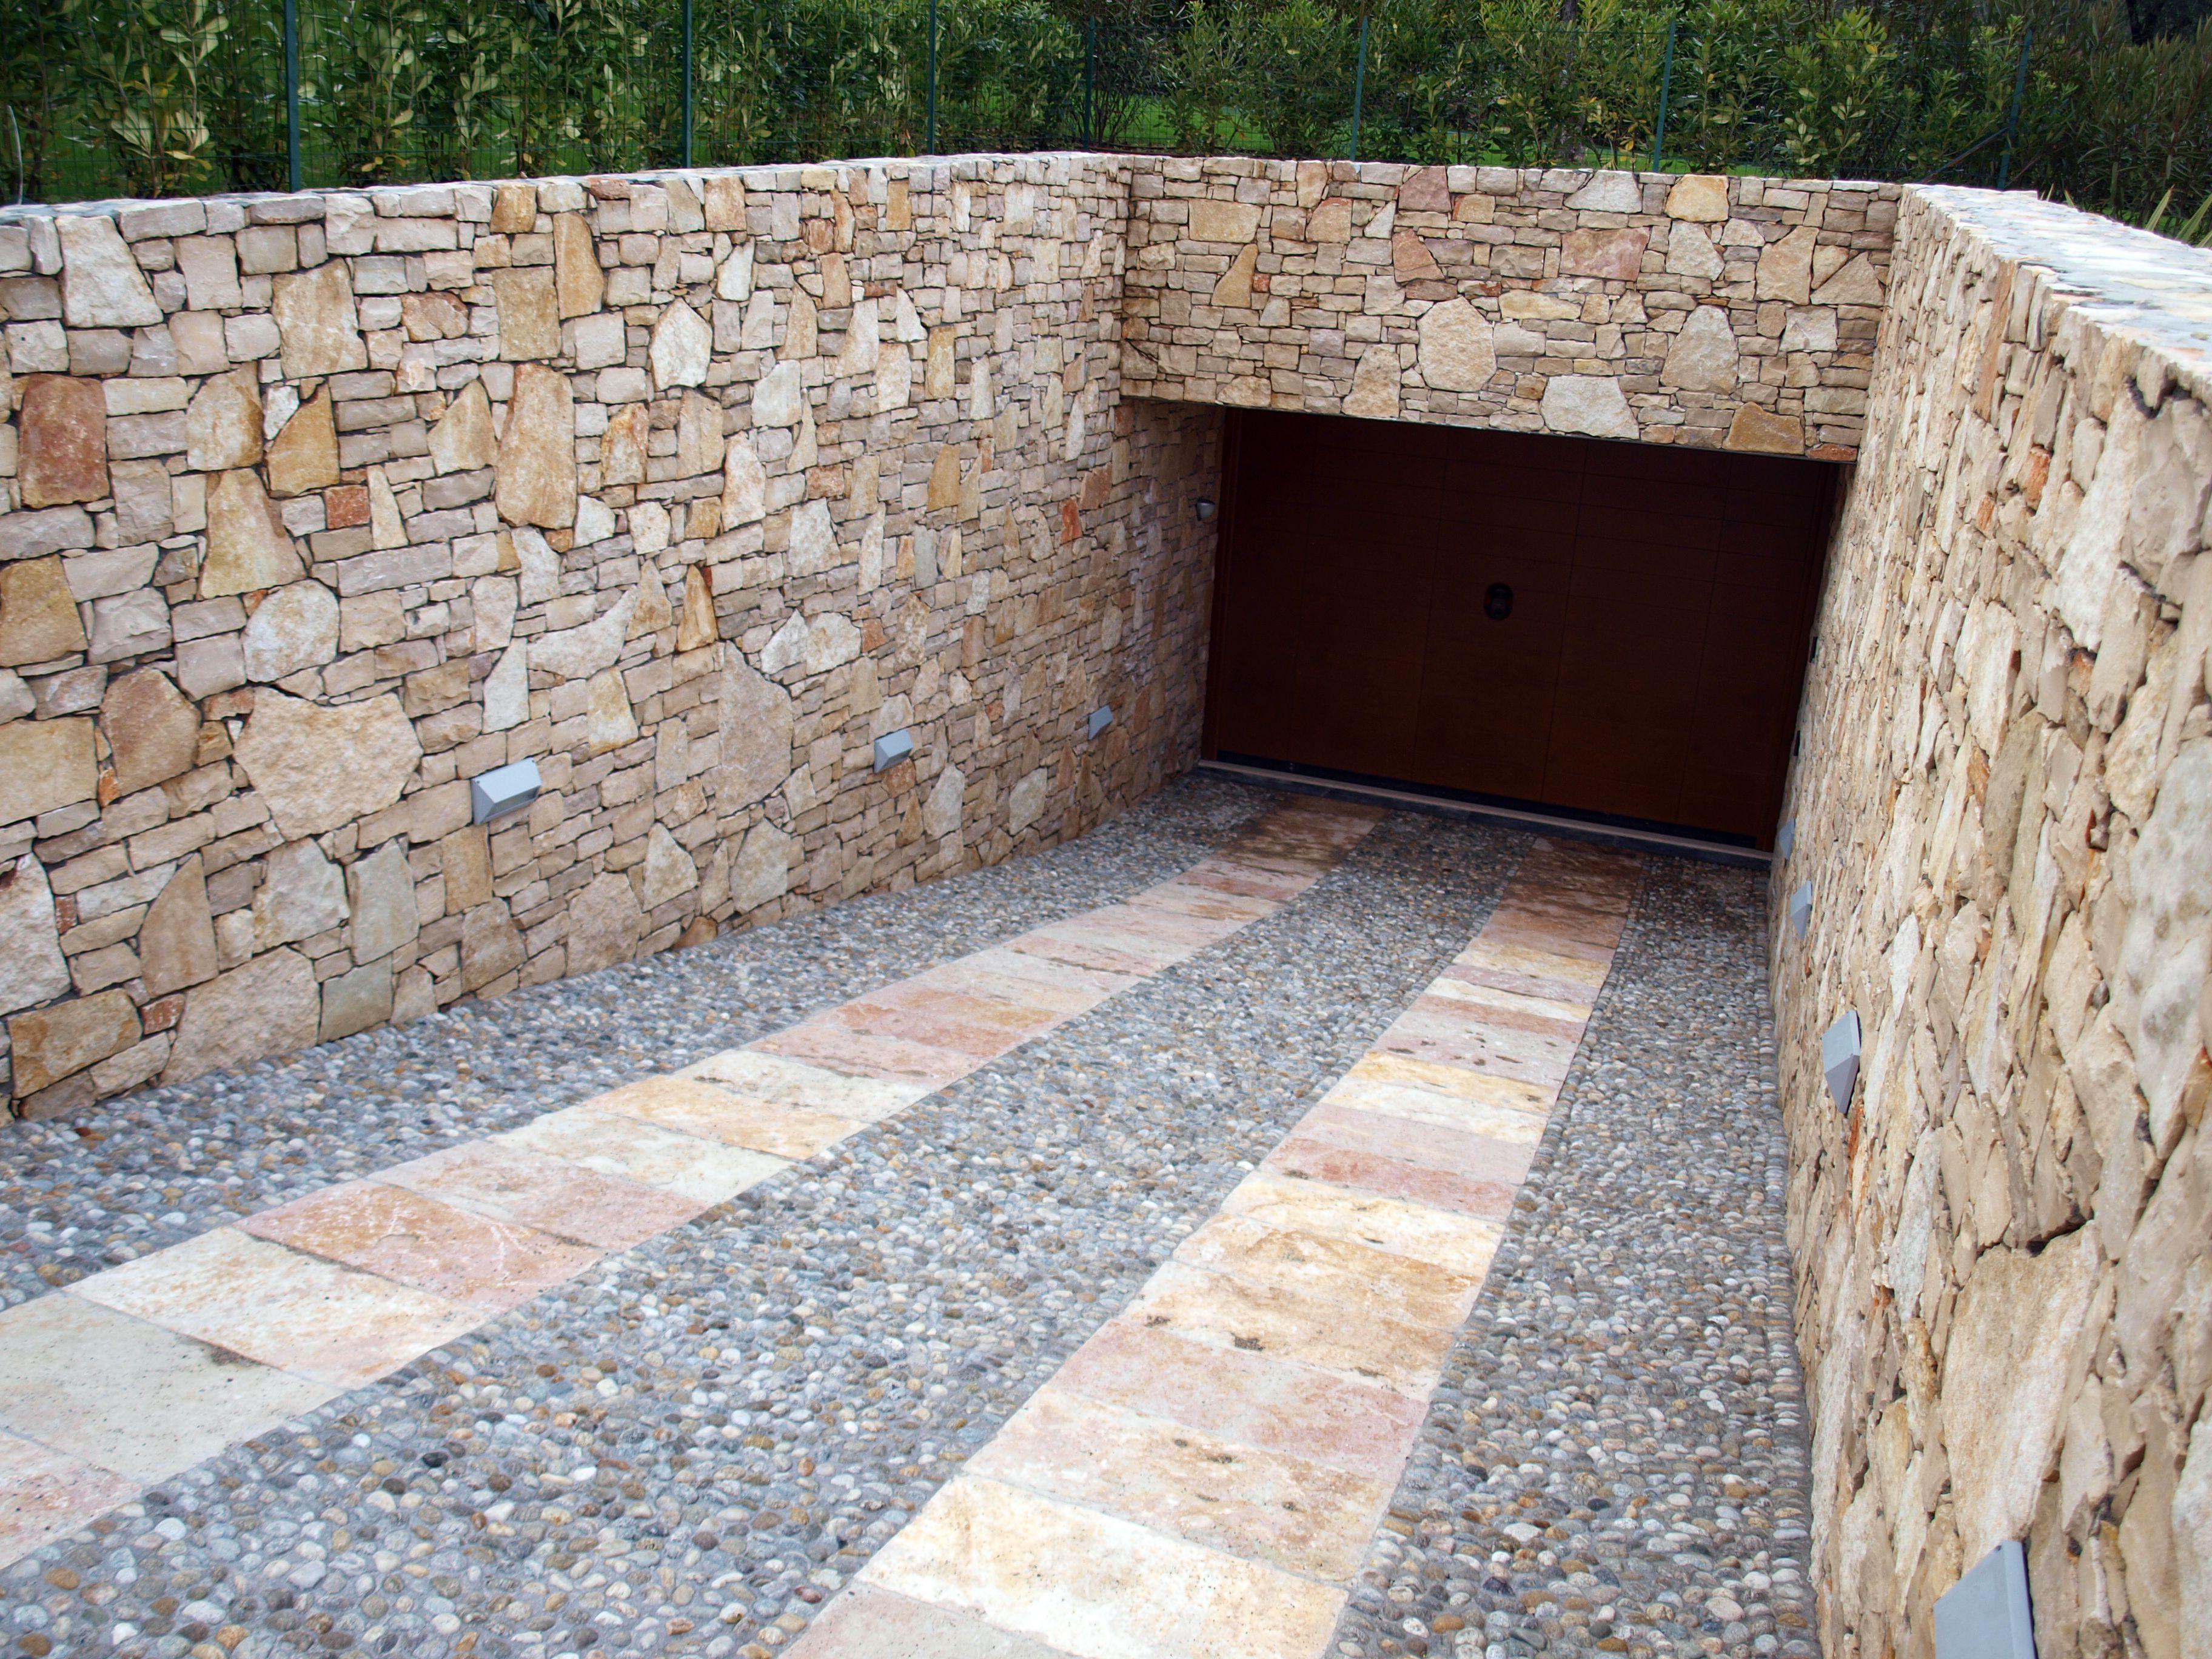 Rampe Garage In Porfido quarzo #floor #pool #natural #garden #stone #pebbles